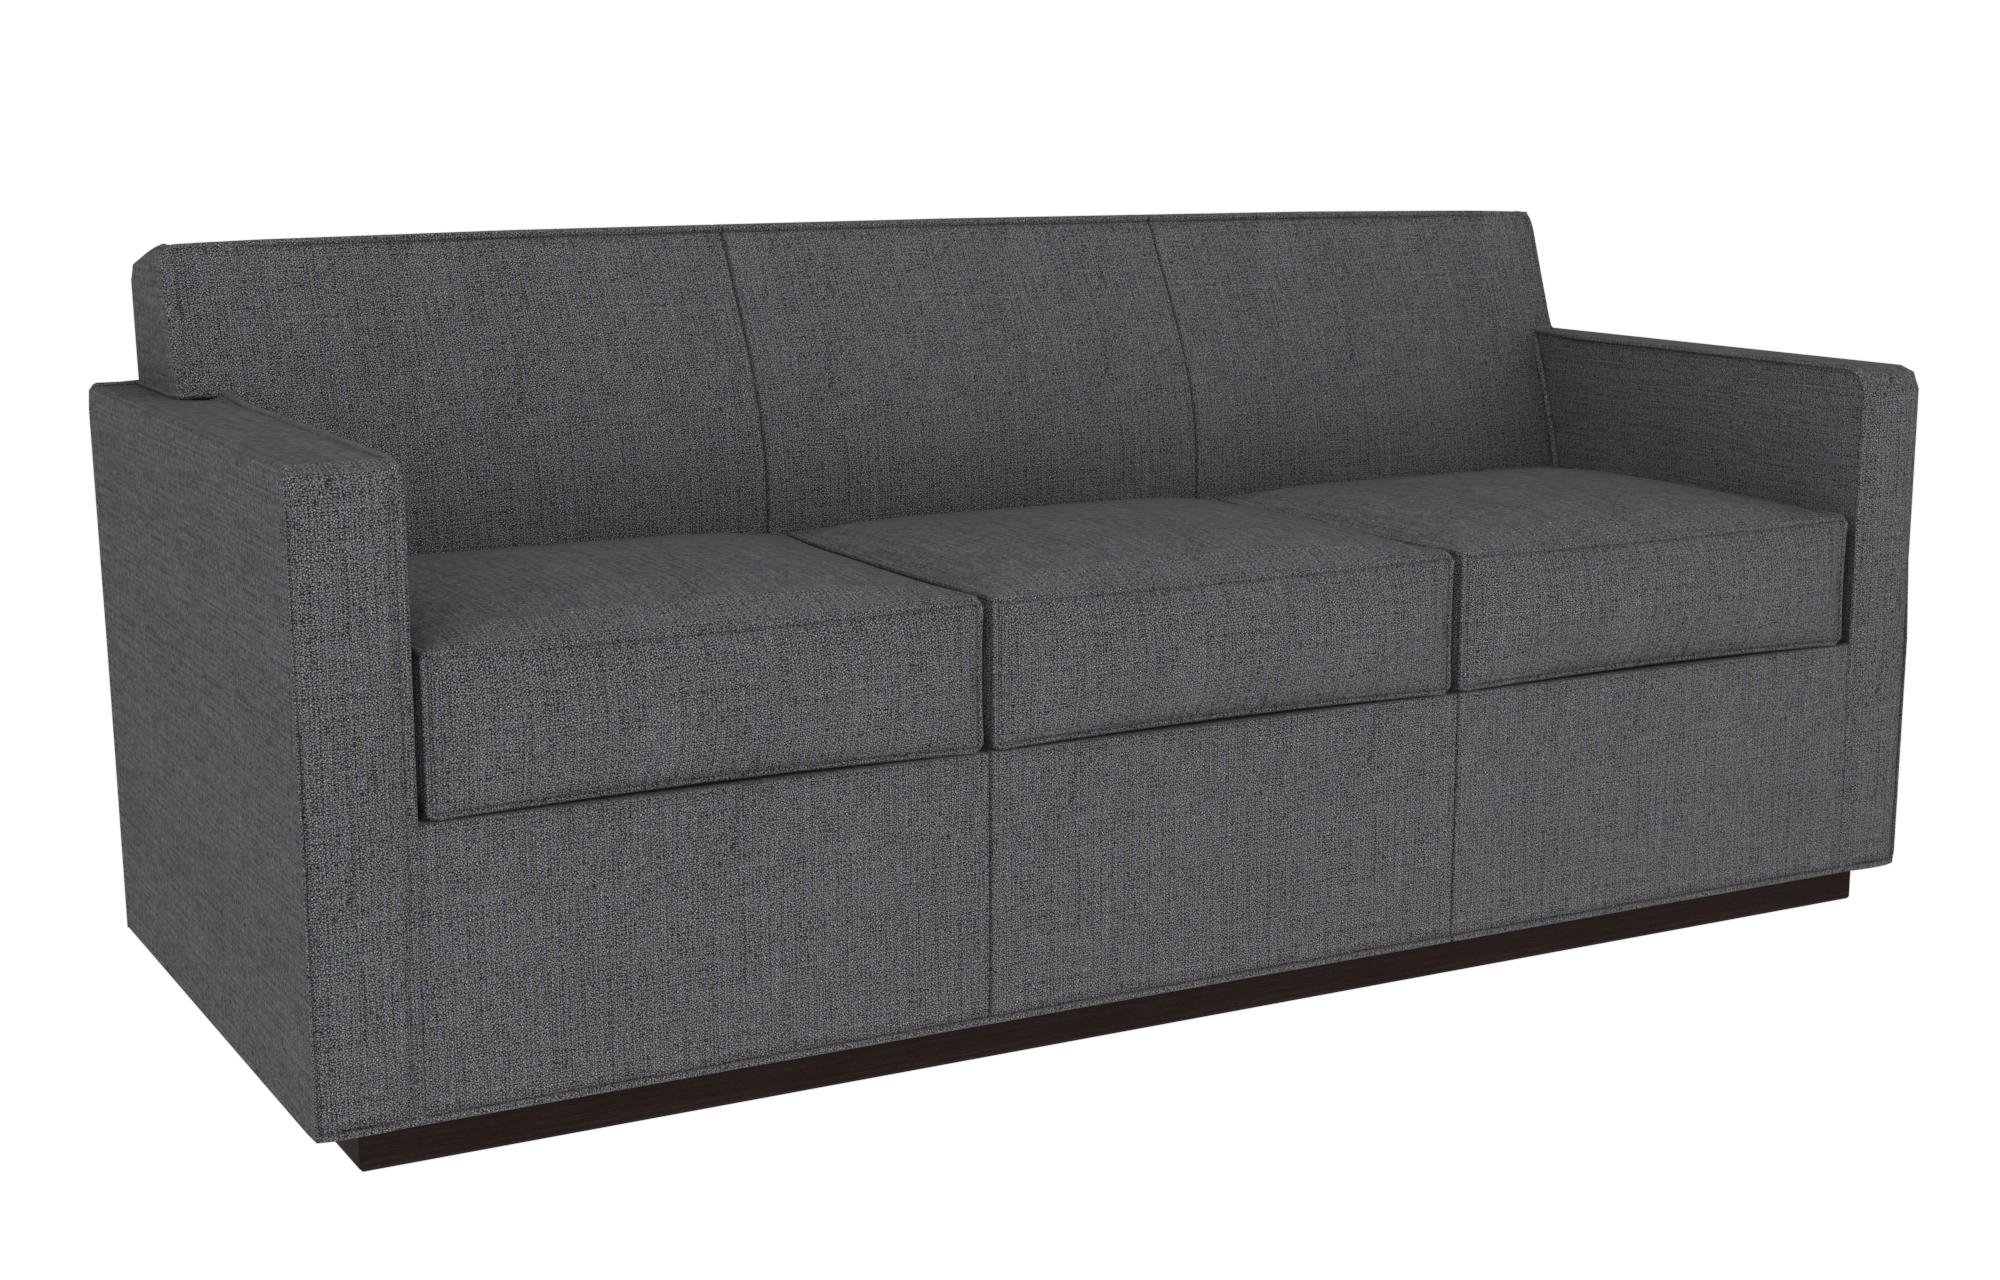 Hickory Contract Tuxedo Sofa 5030